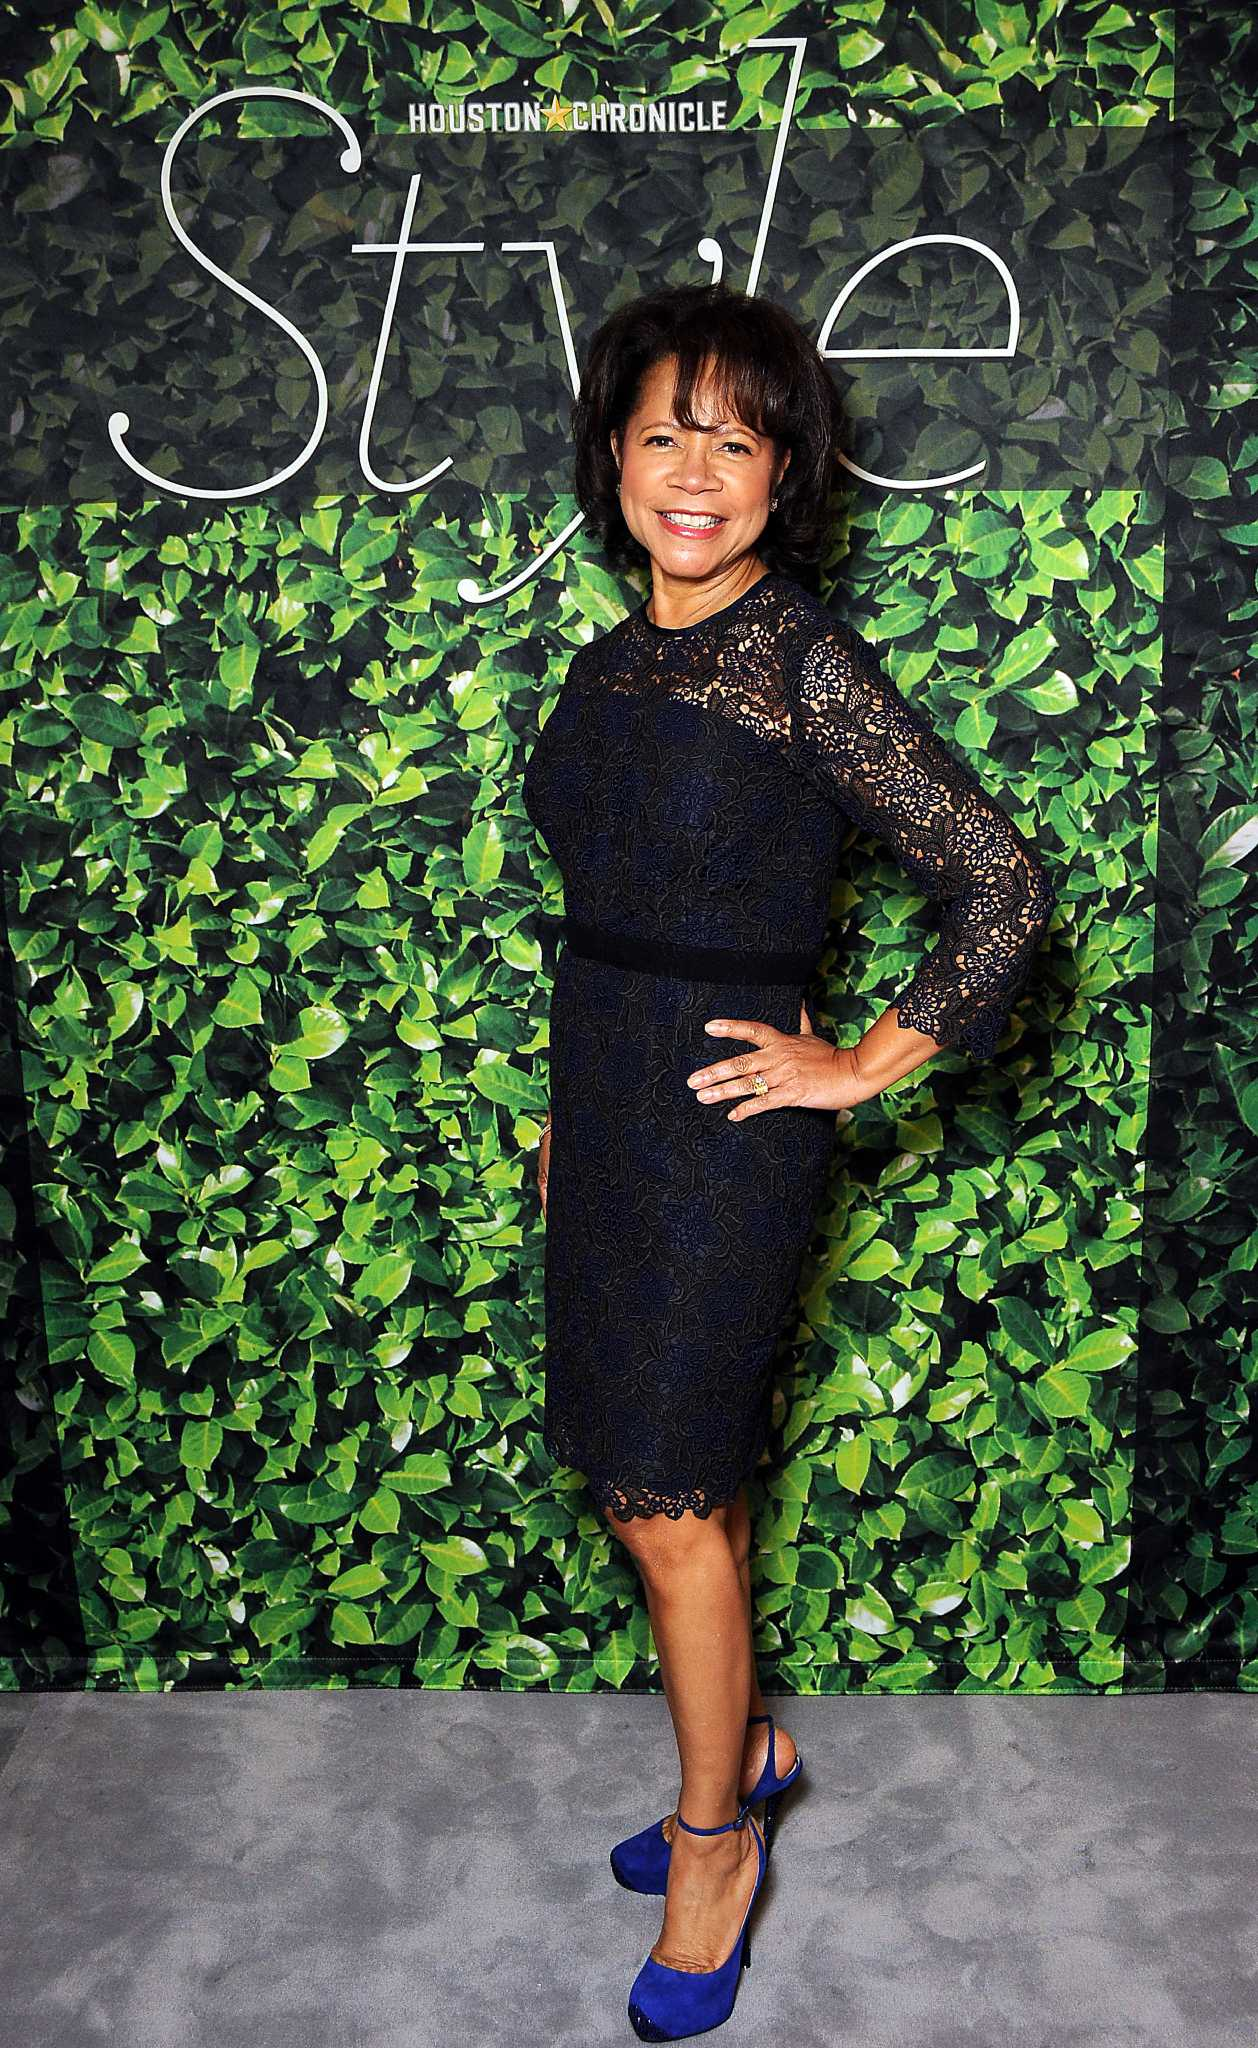 b137ed9c6de9 Best Dressed profile  Merele Gail Yarborough - Houston Chronicle